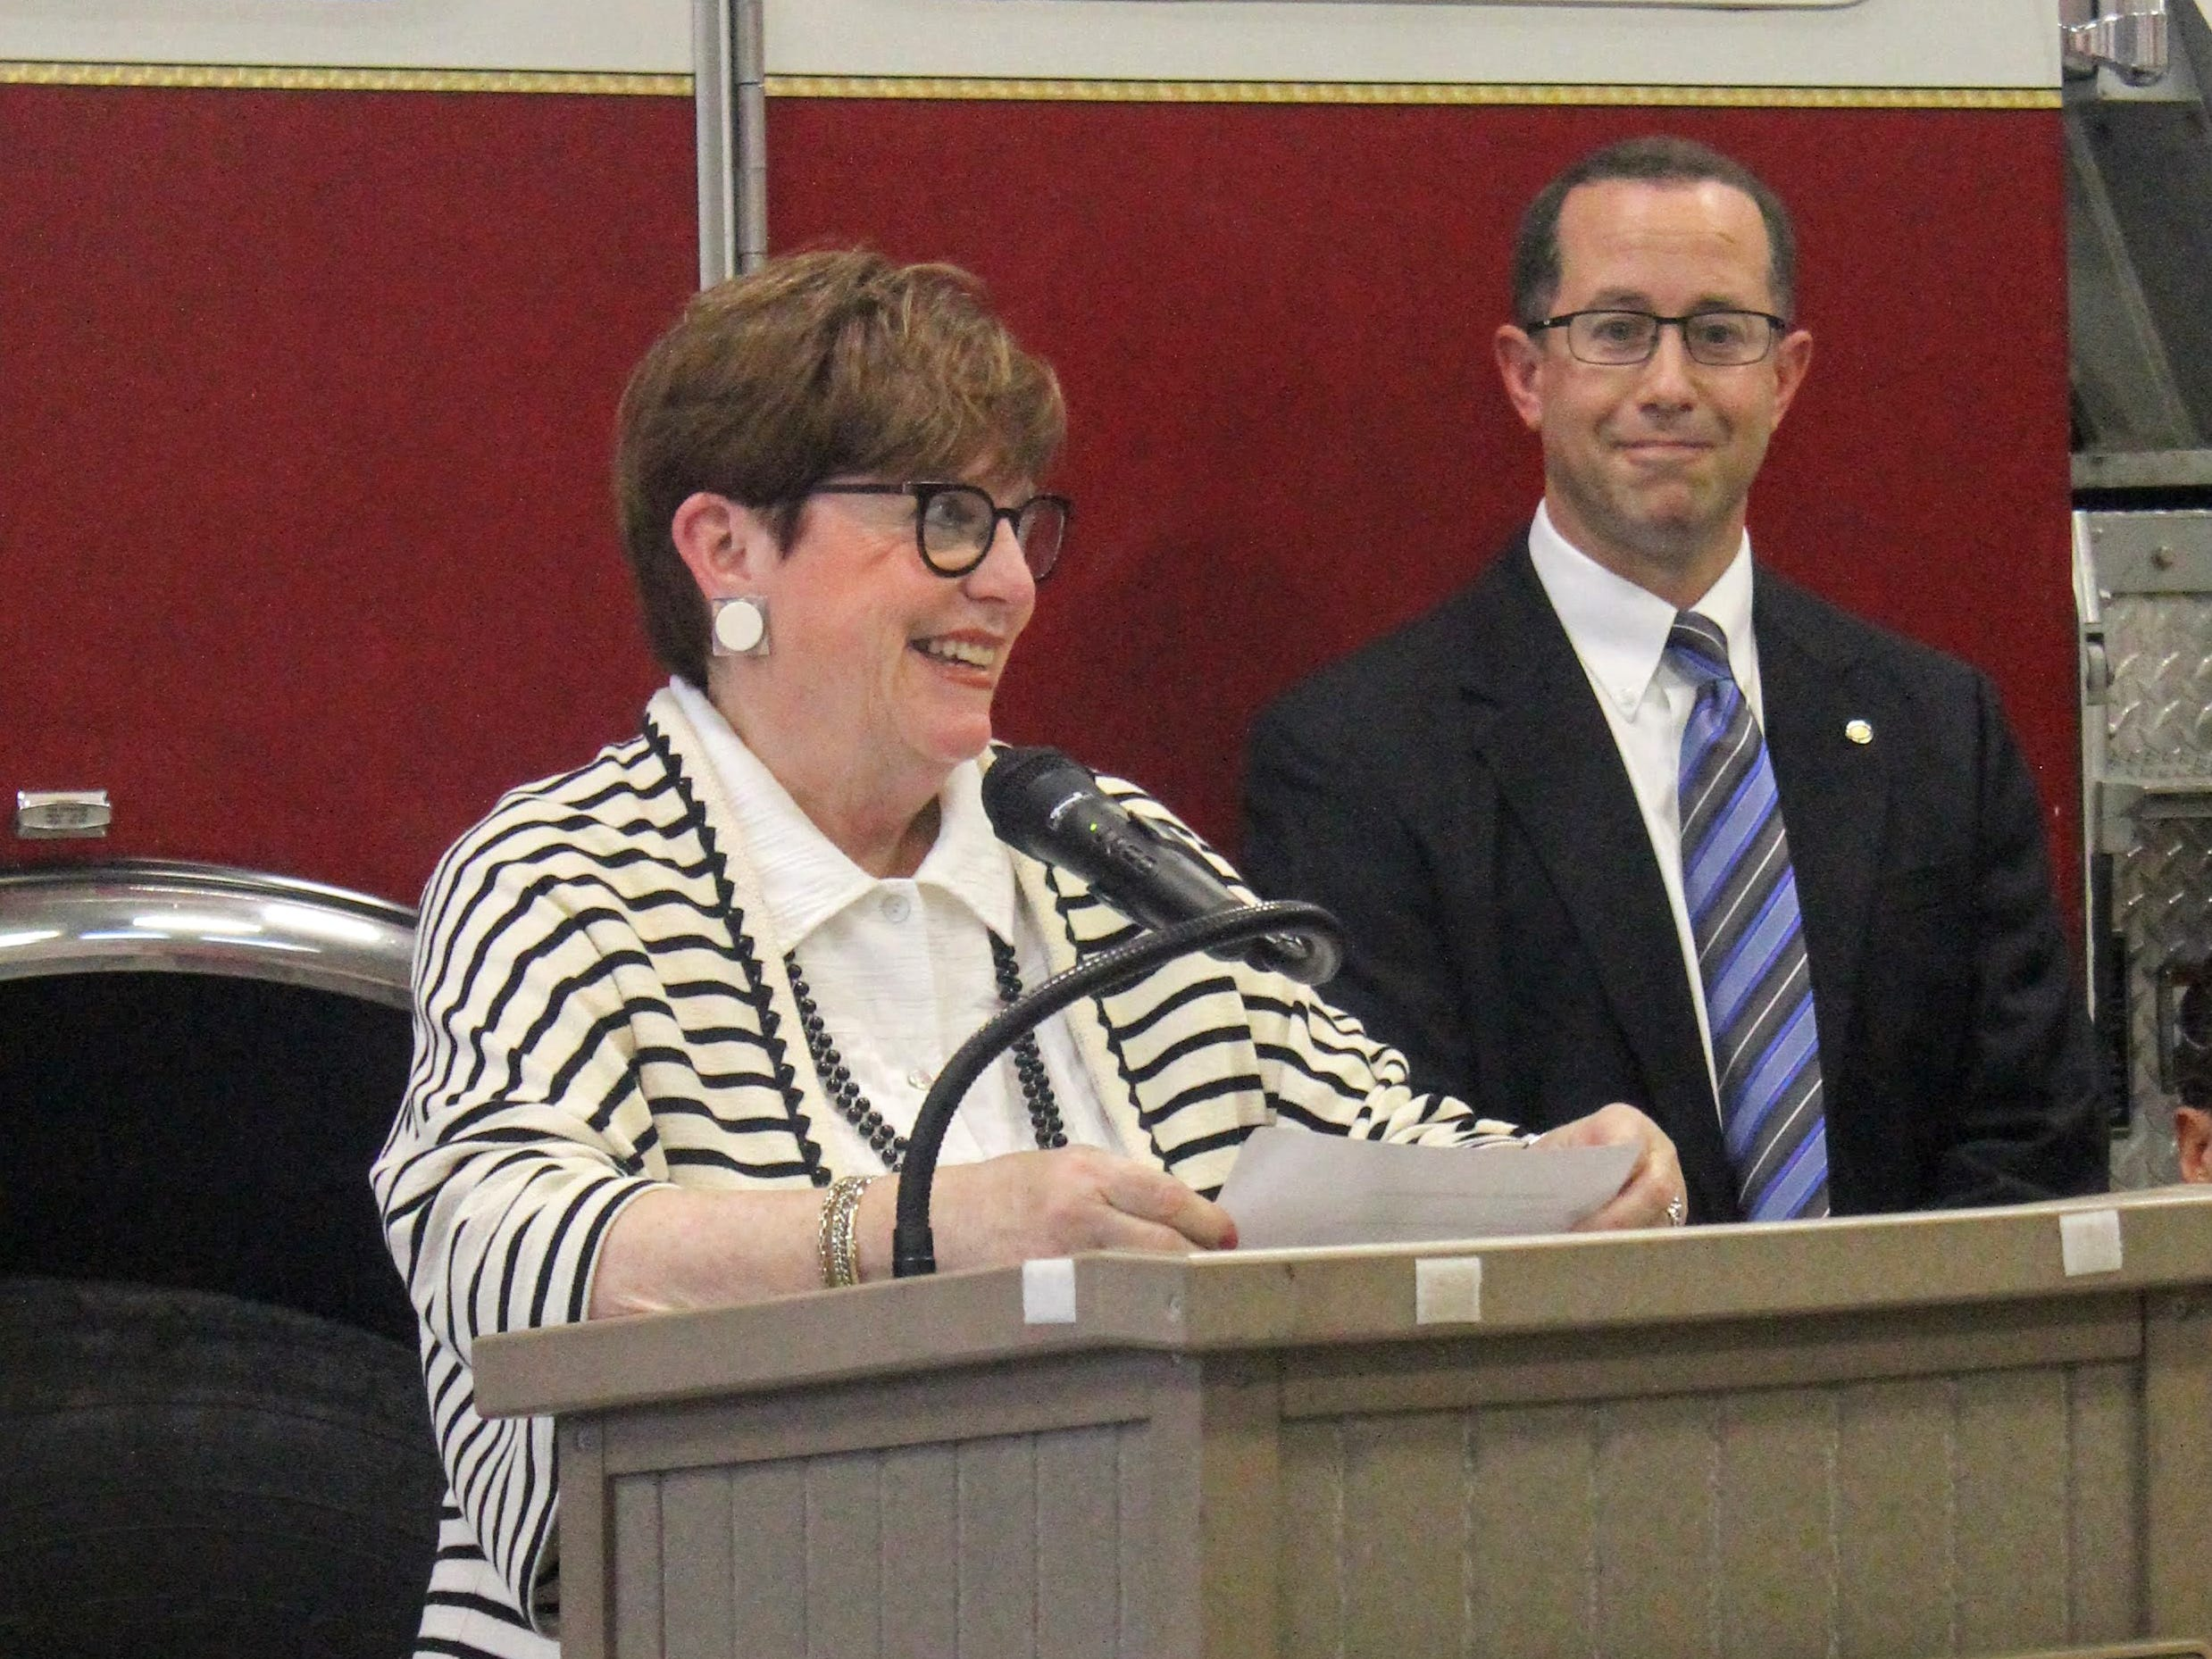 Mayor Pro Tem Patty Bordman speaks while City Manager Joe Valentine listens.